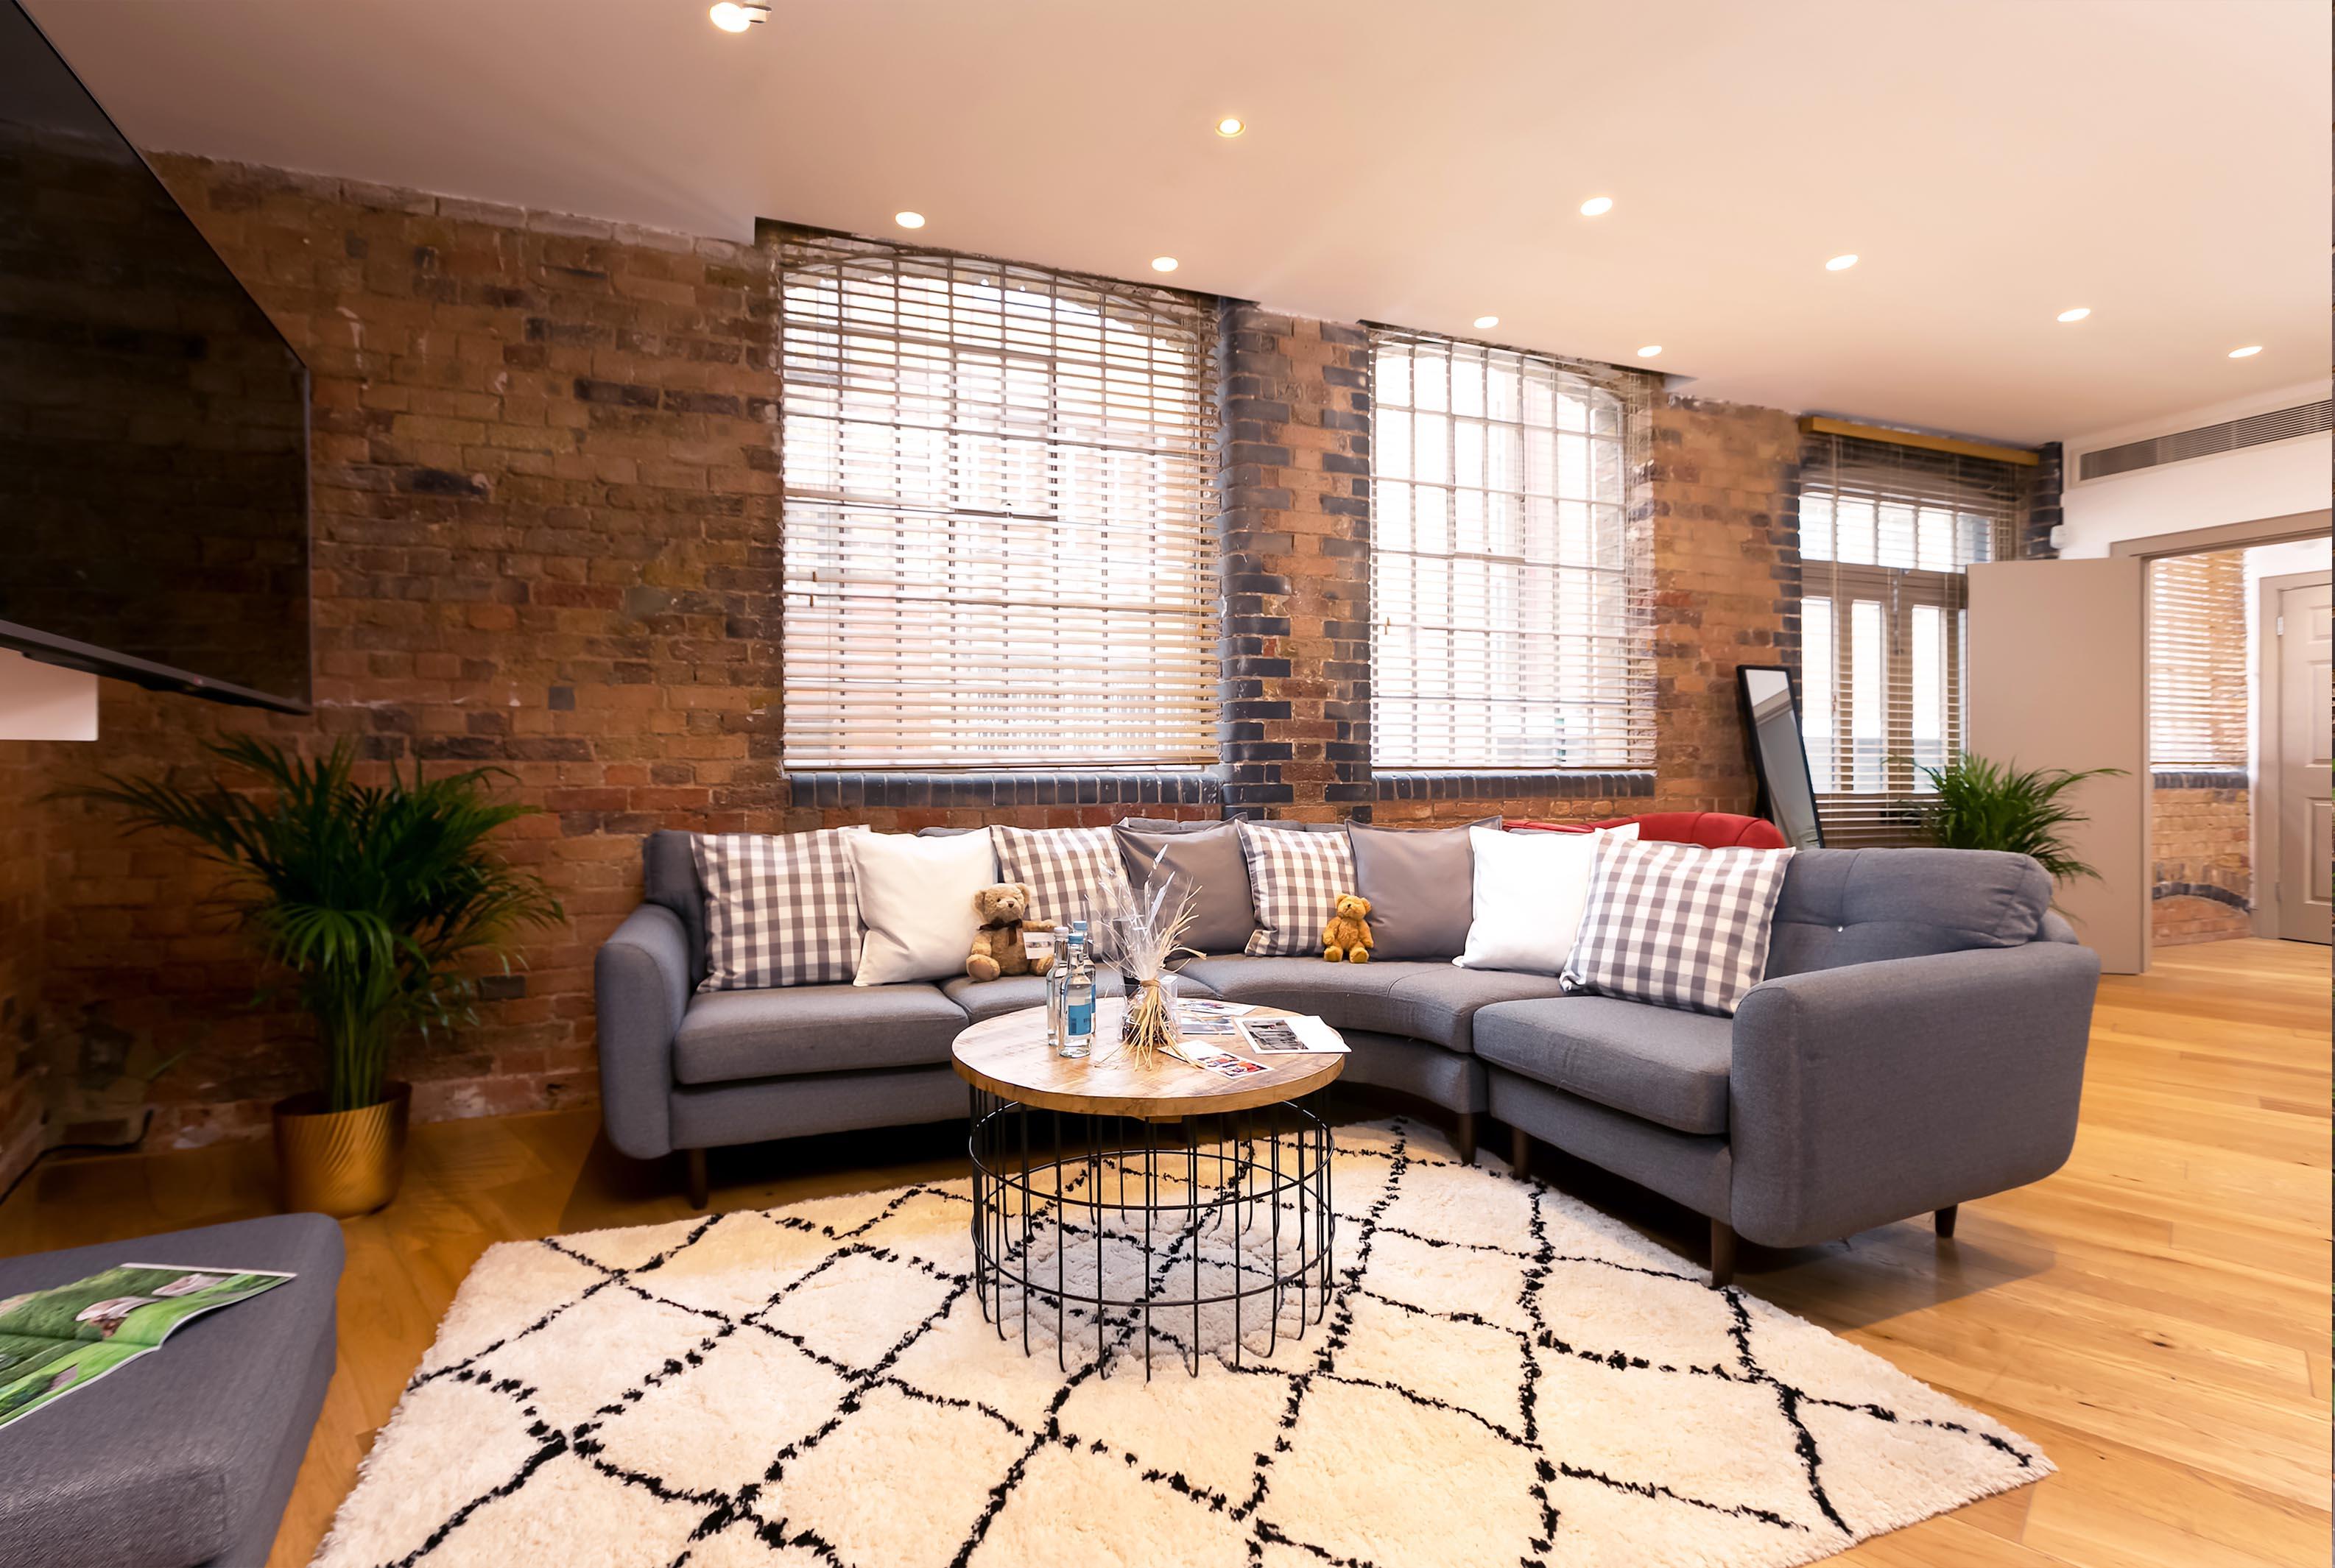 Lovelydays luxury service apartment rental - London - Fitzrovia - Wells Mews B - Lovelysuite - 2 bedrooms - 2 bathrooms - Comfortable sofa - ad8ed84ea6b6 - Lovelydays